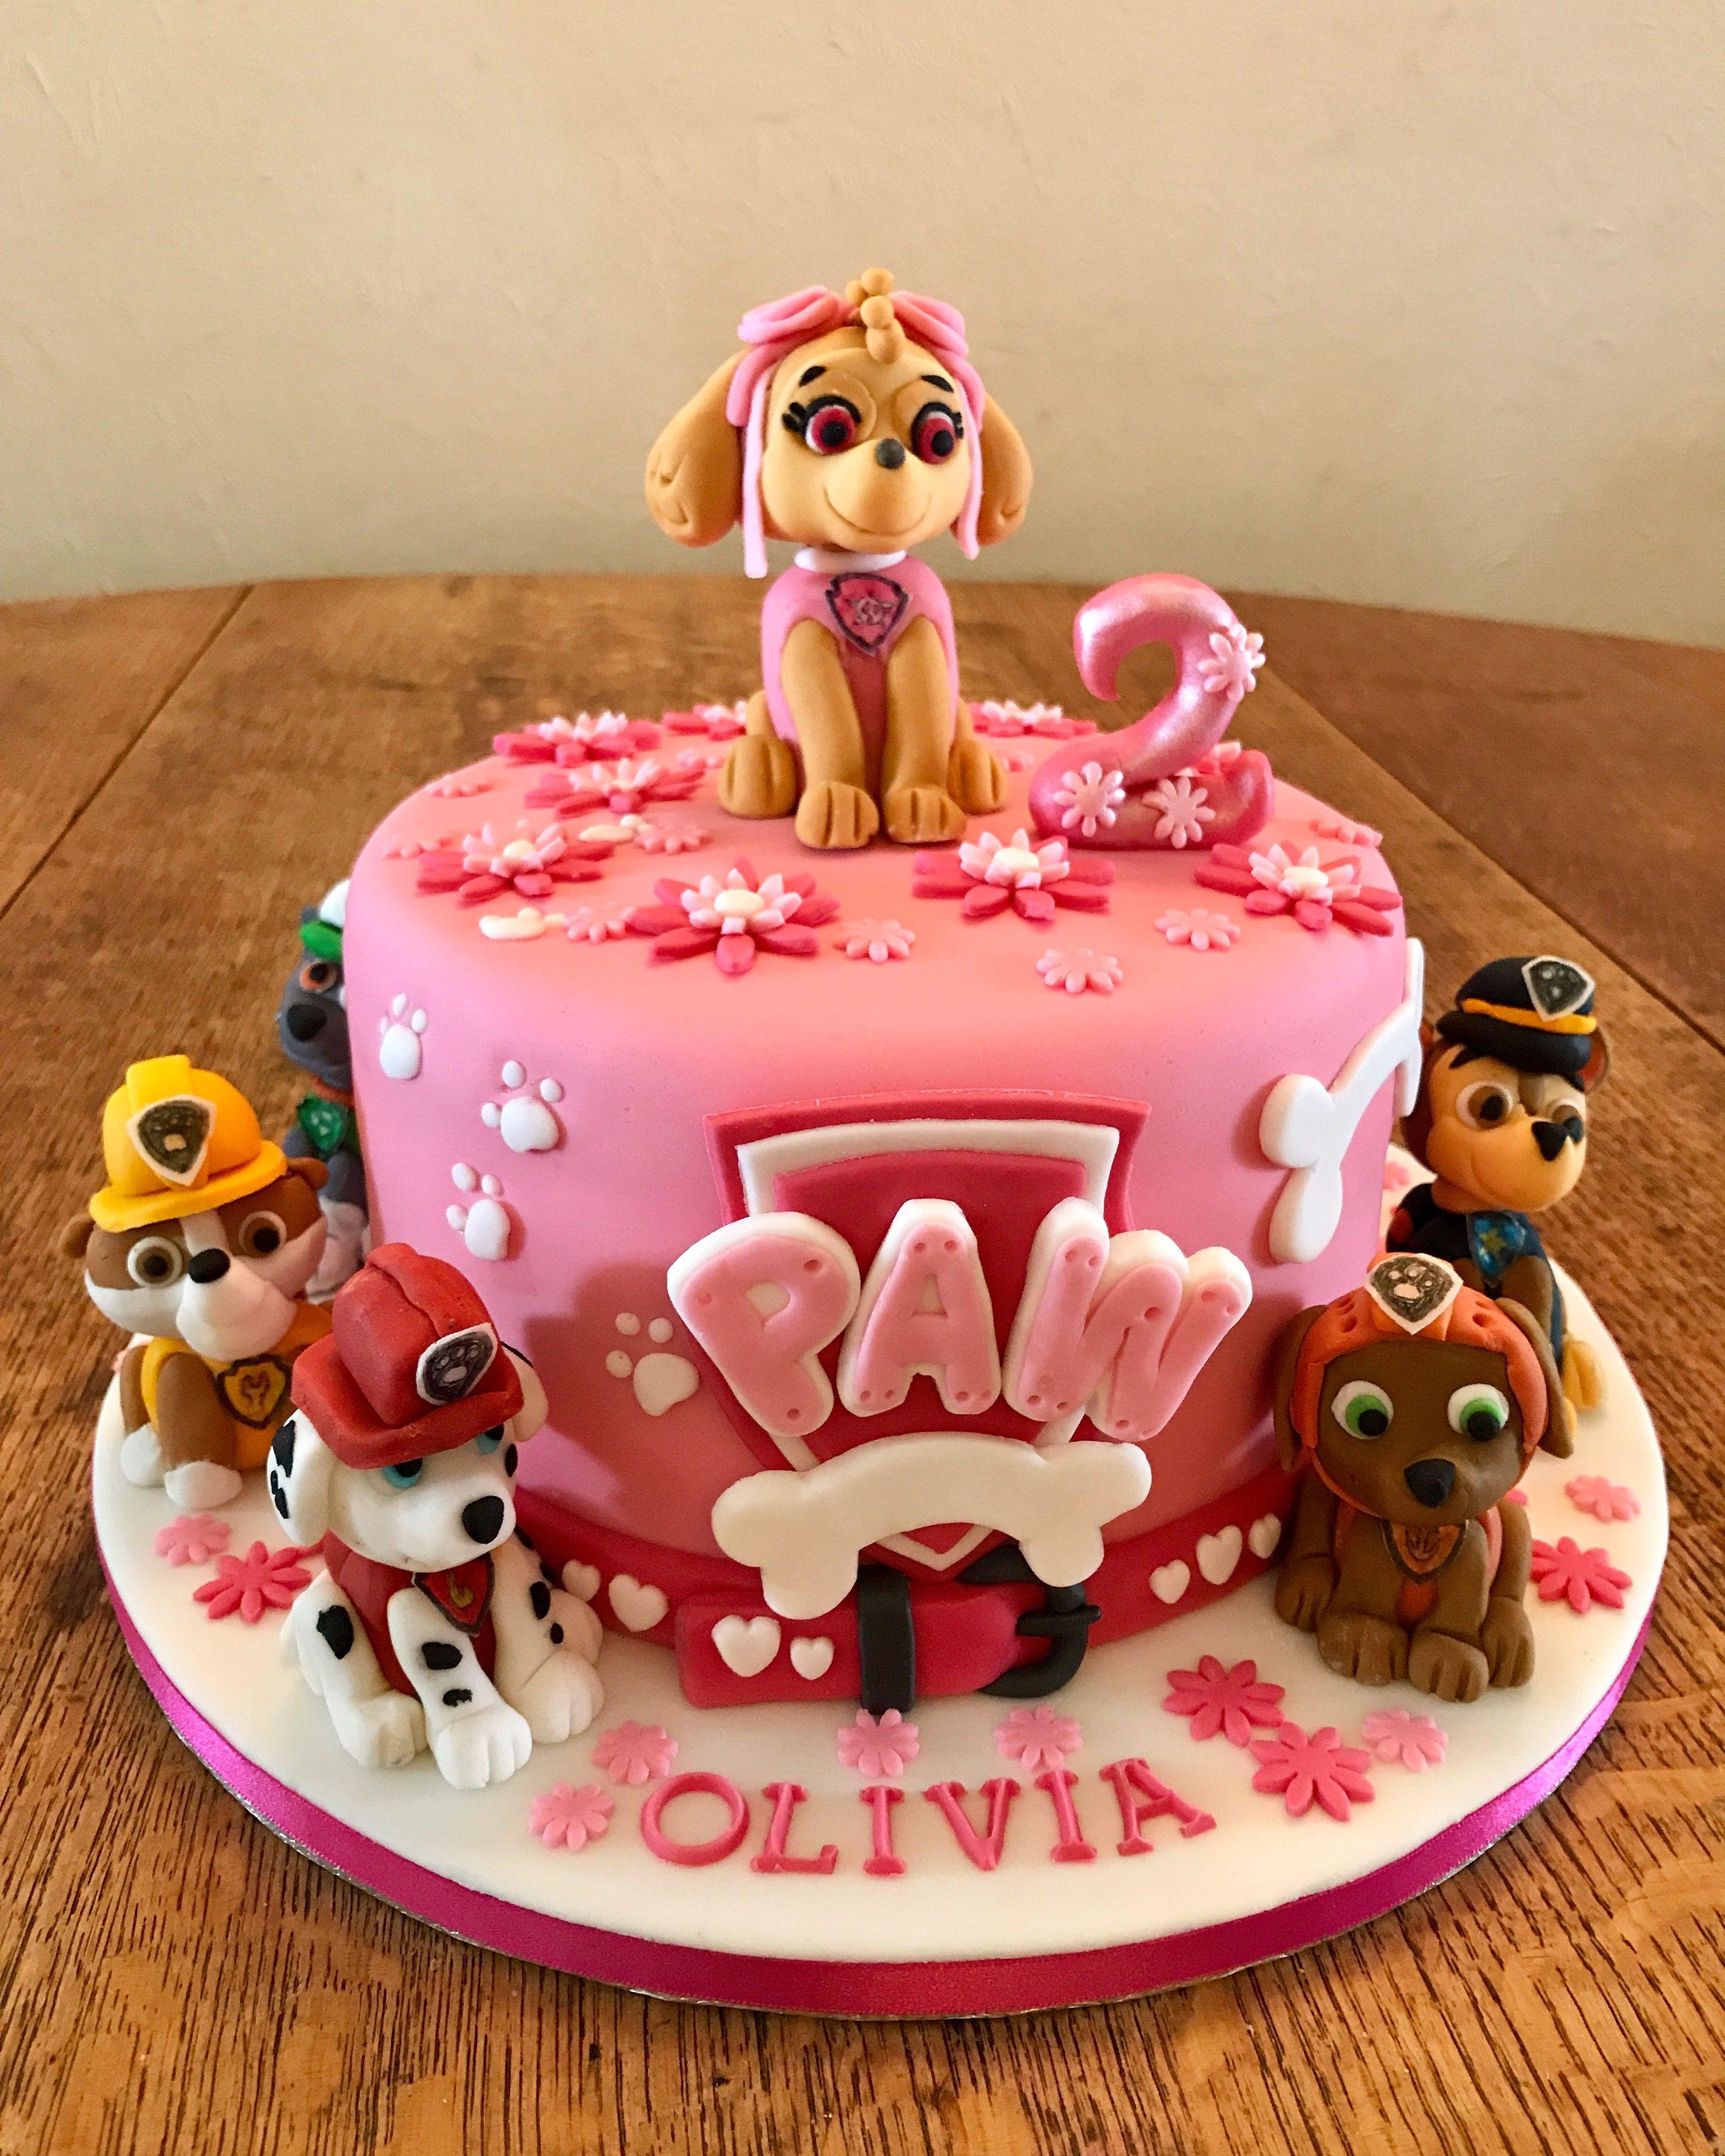 Paw Patrol Skye Cake Lillie 3rd Birthday In 2019 Paw